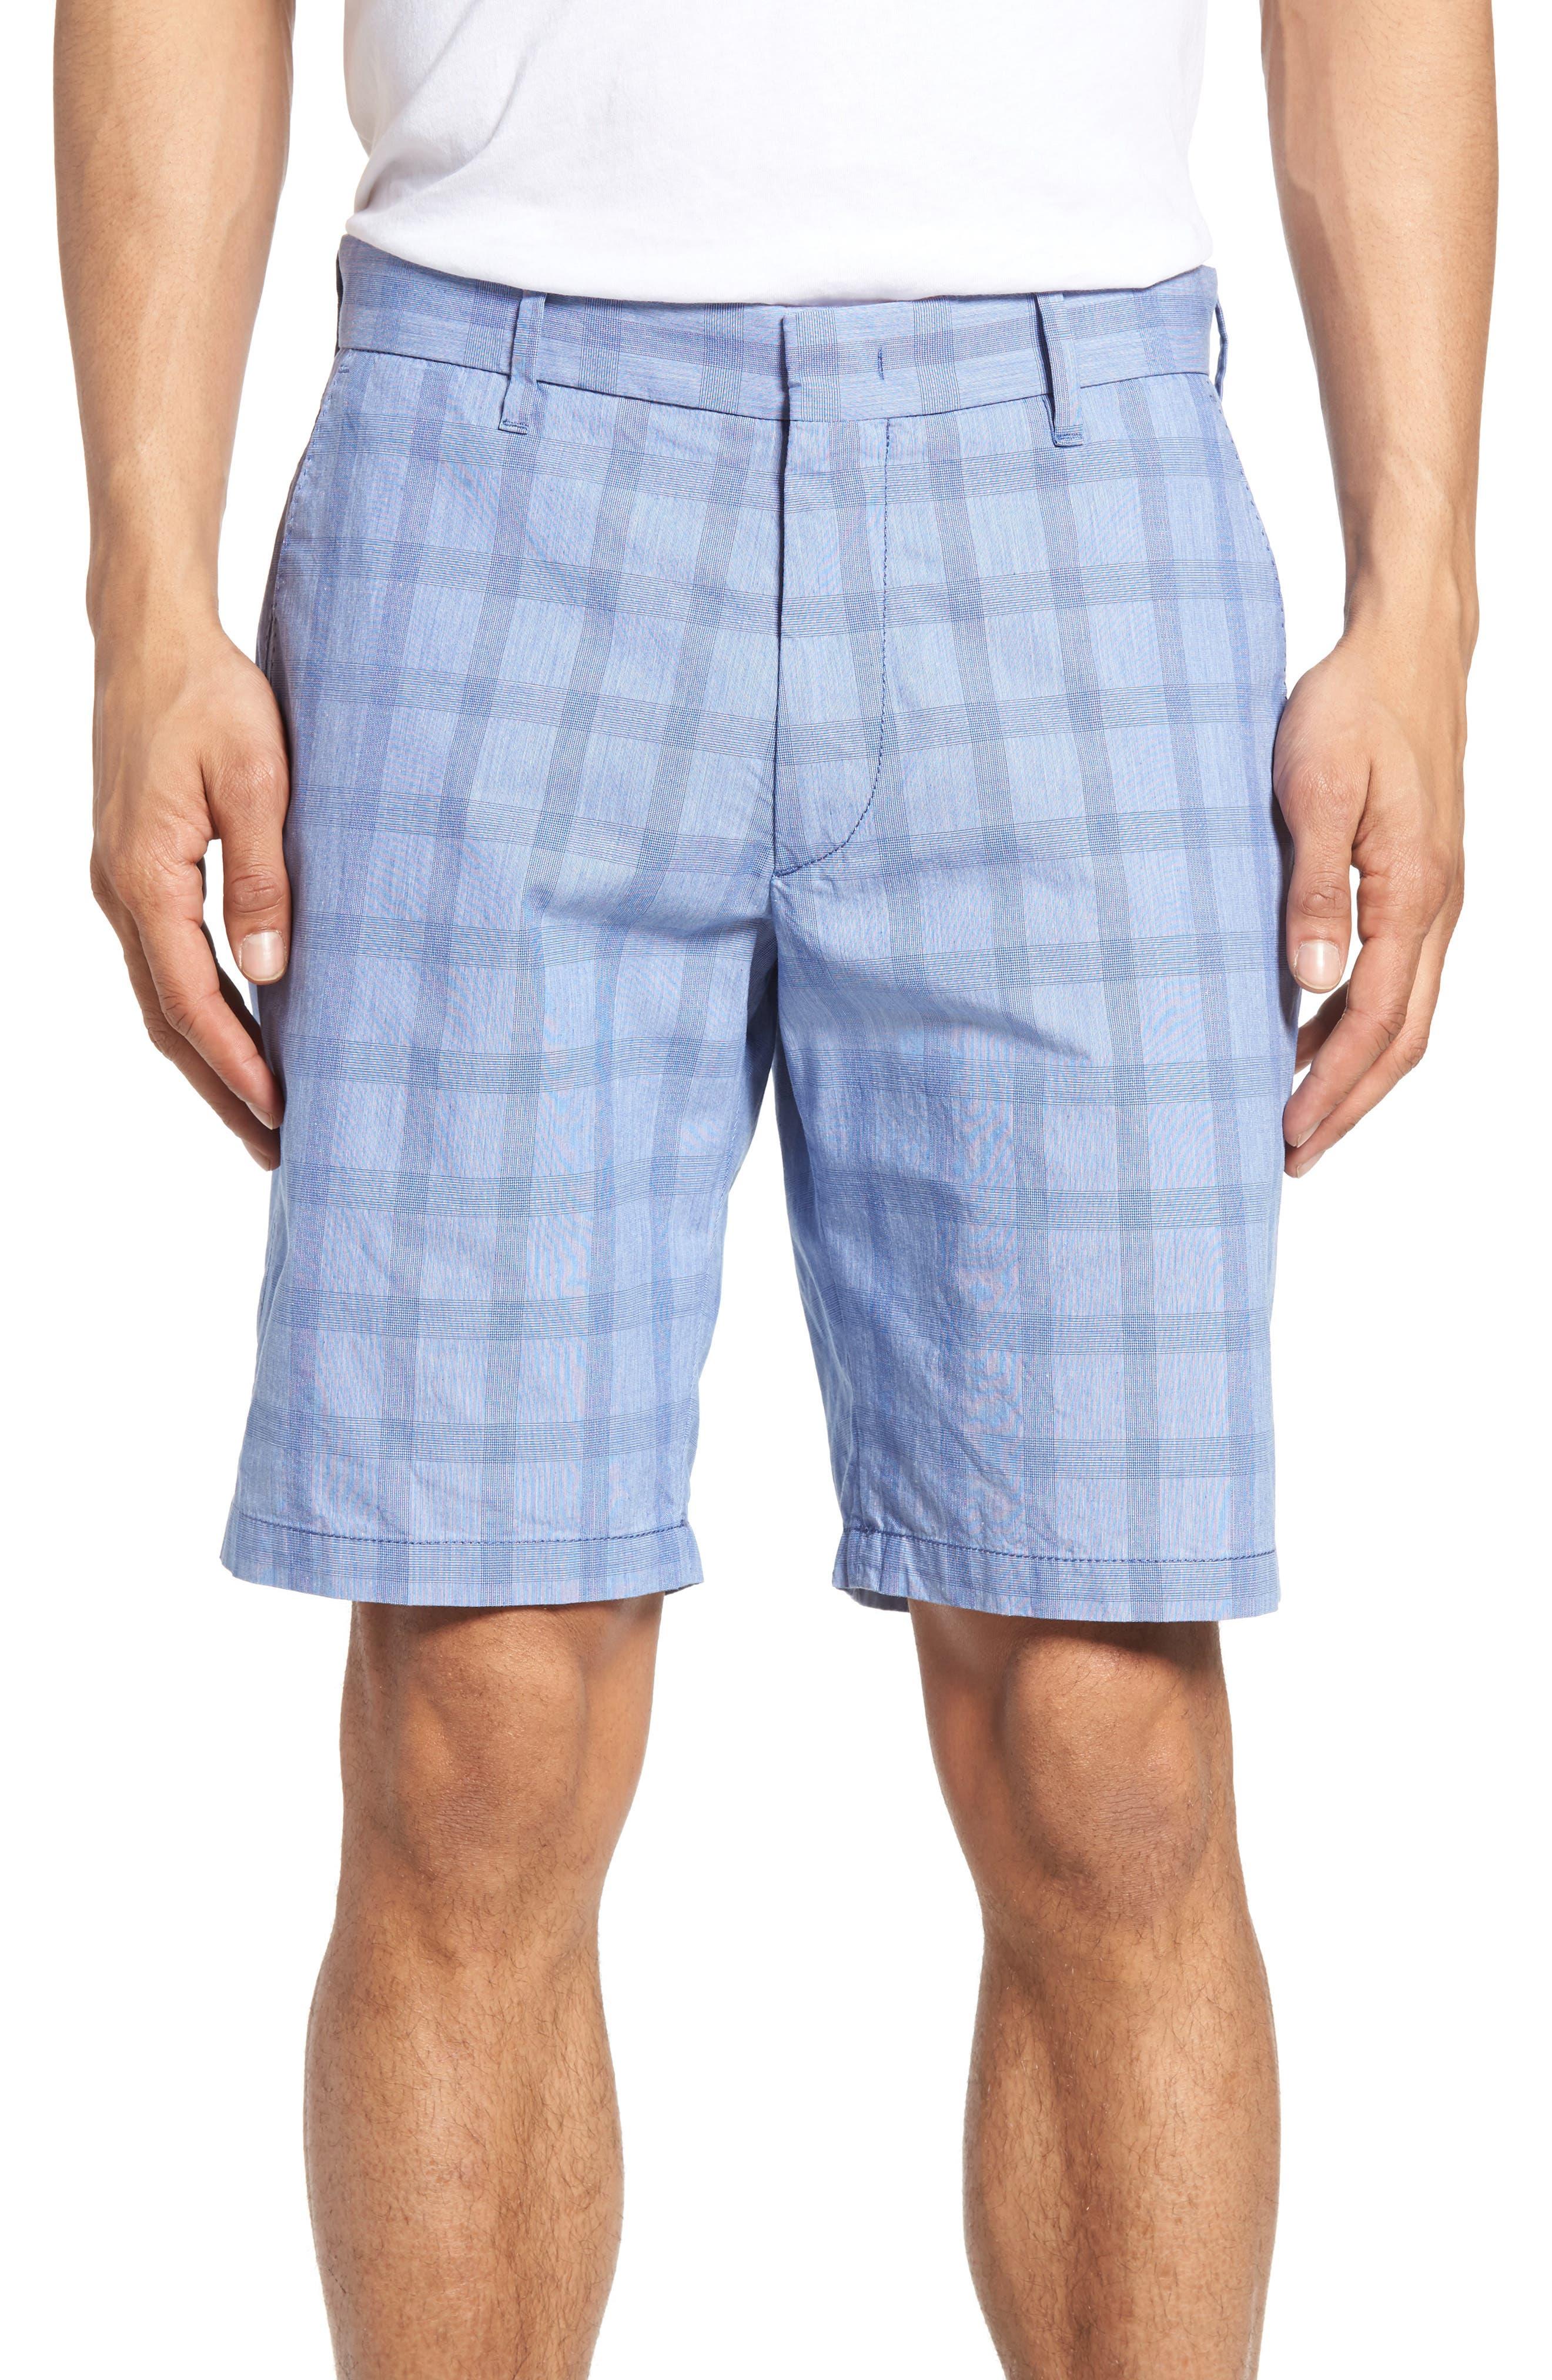 Antrorse Plaid Shorts,                             Main thumbnail 1, color,                             400